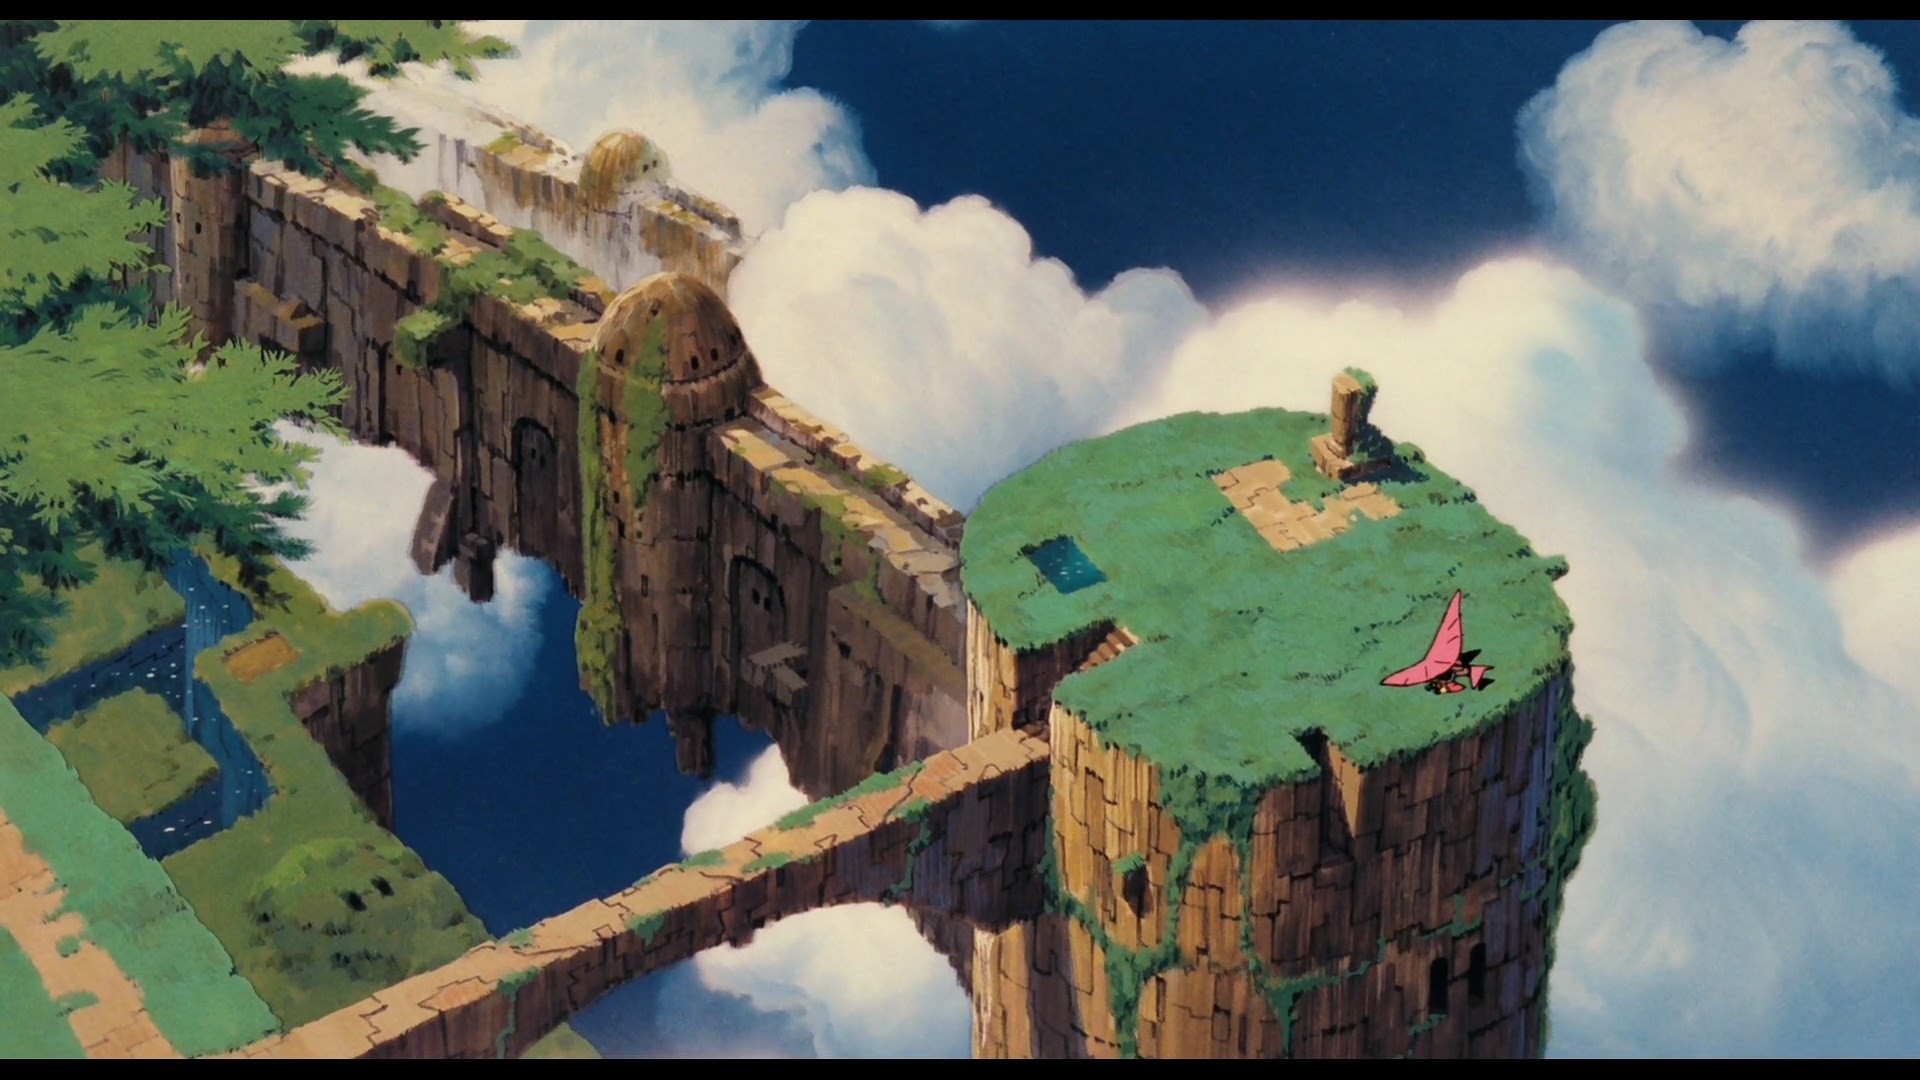 computer wallpaper for laputa castle in the sky